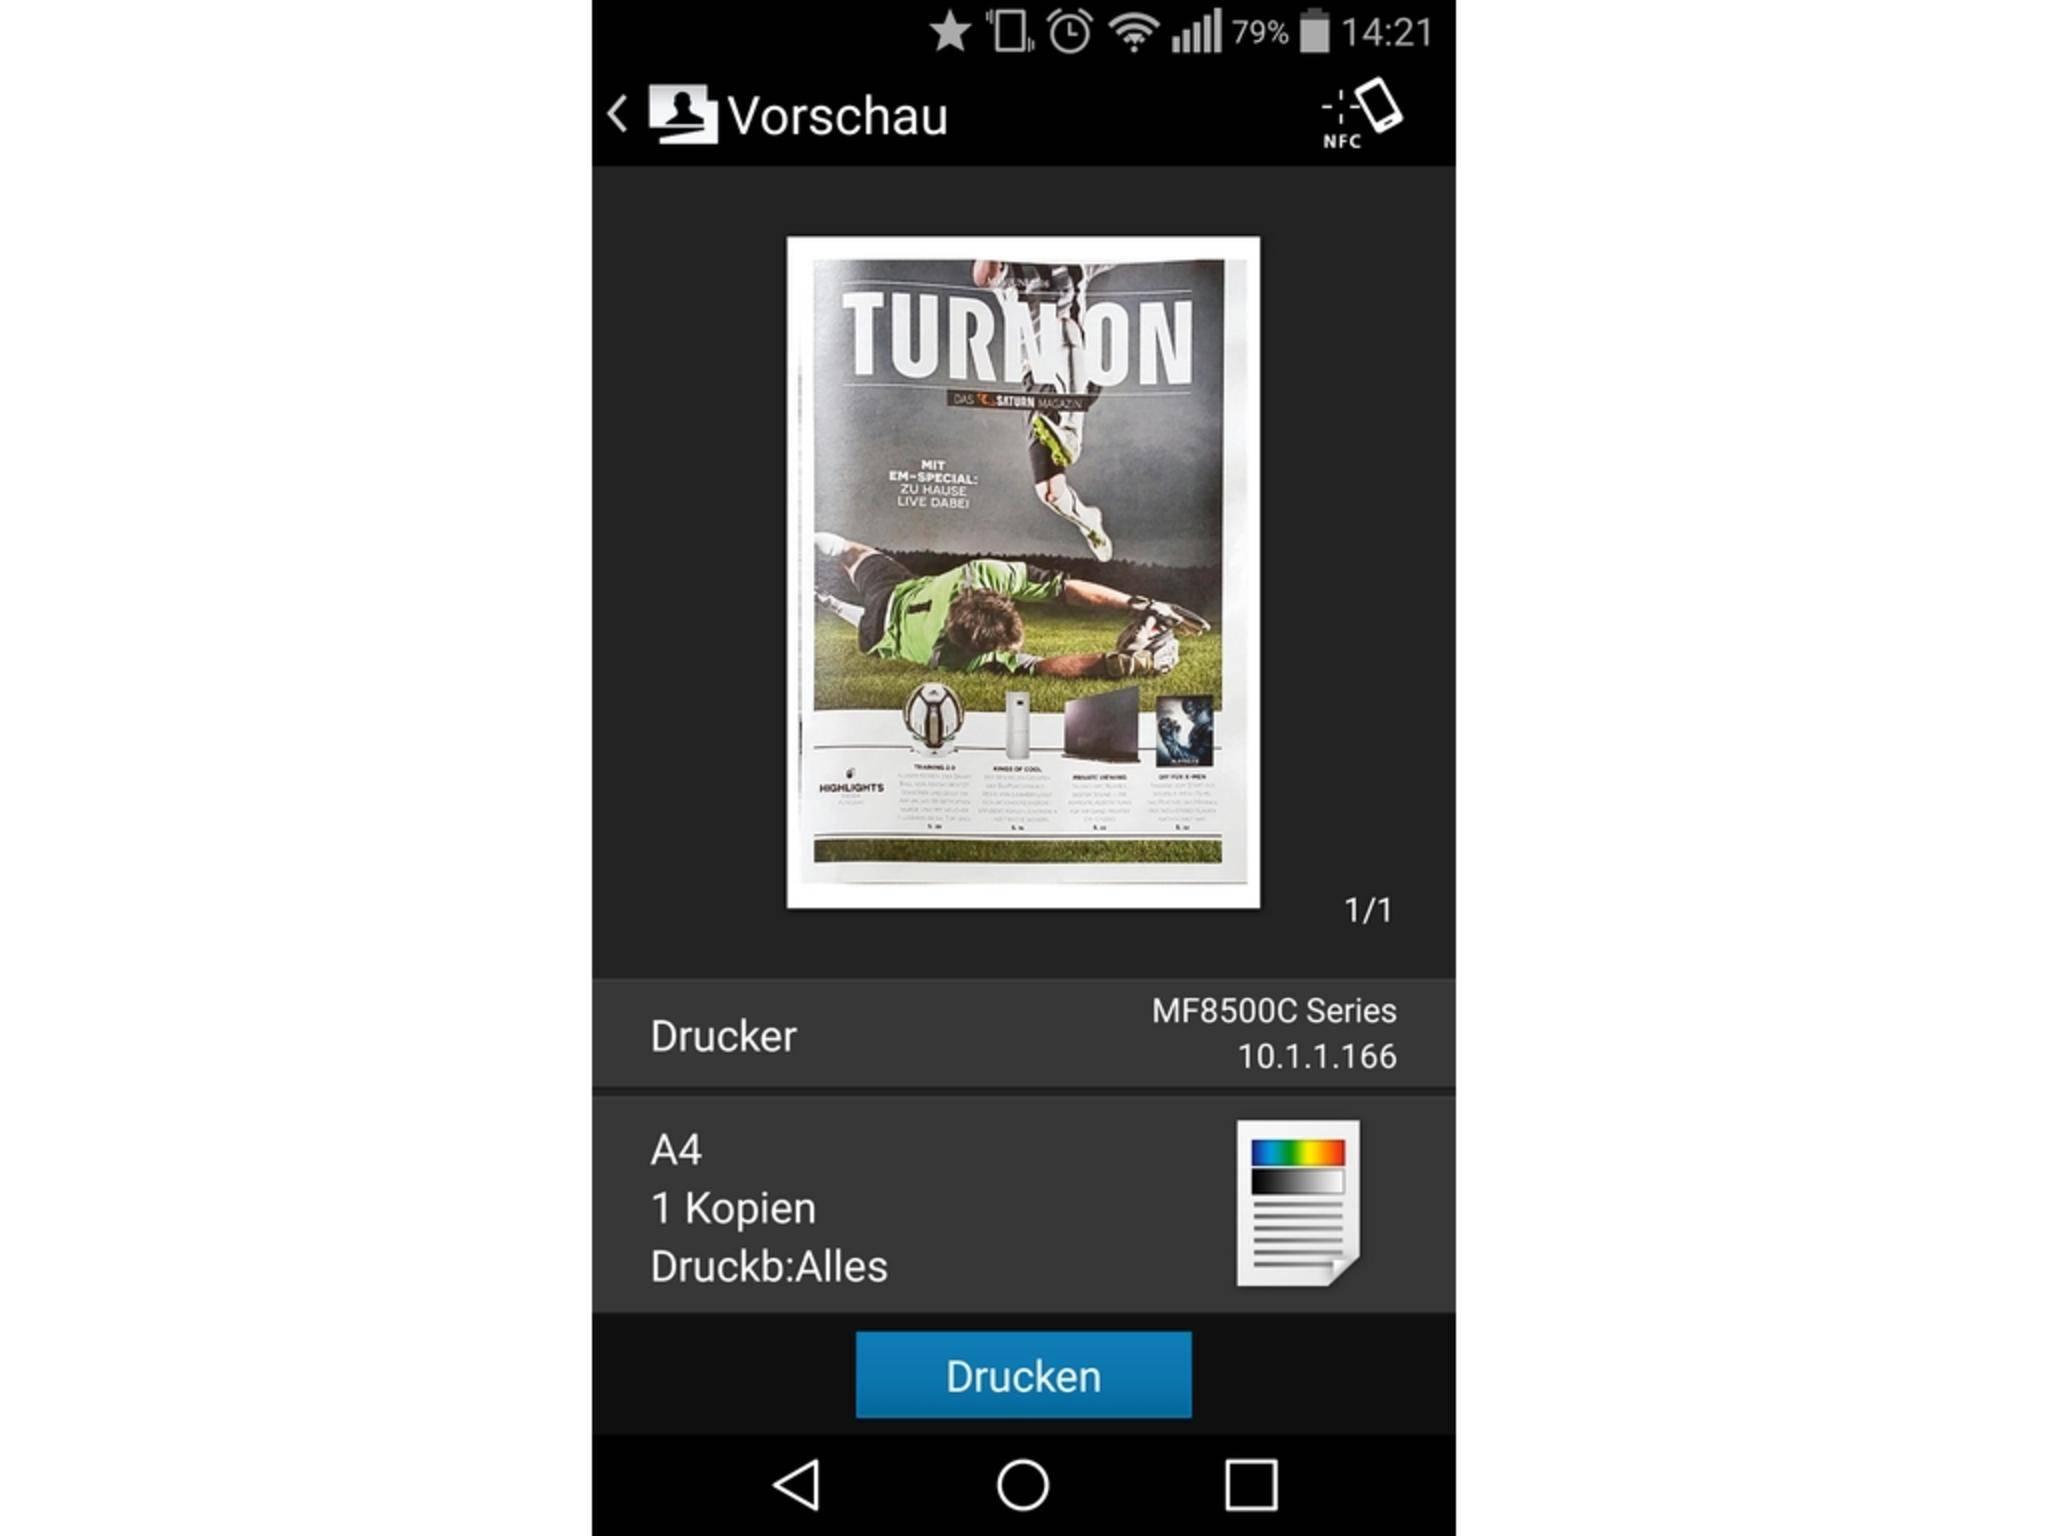 Drucken_Android01